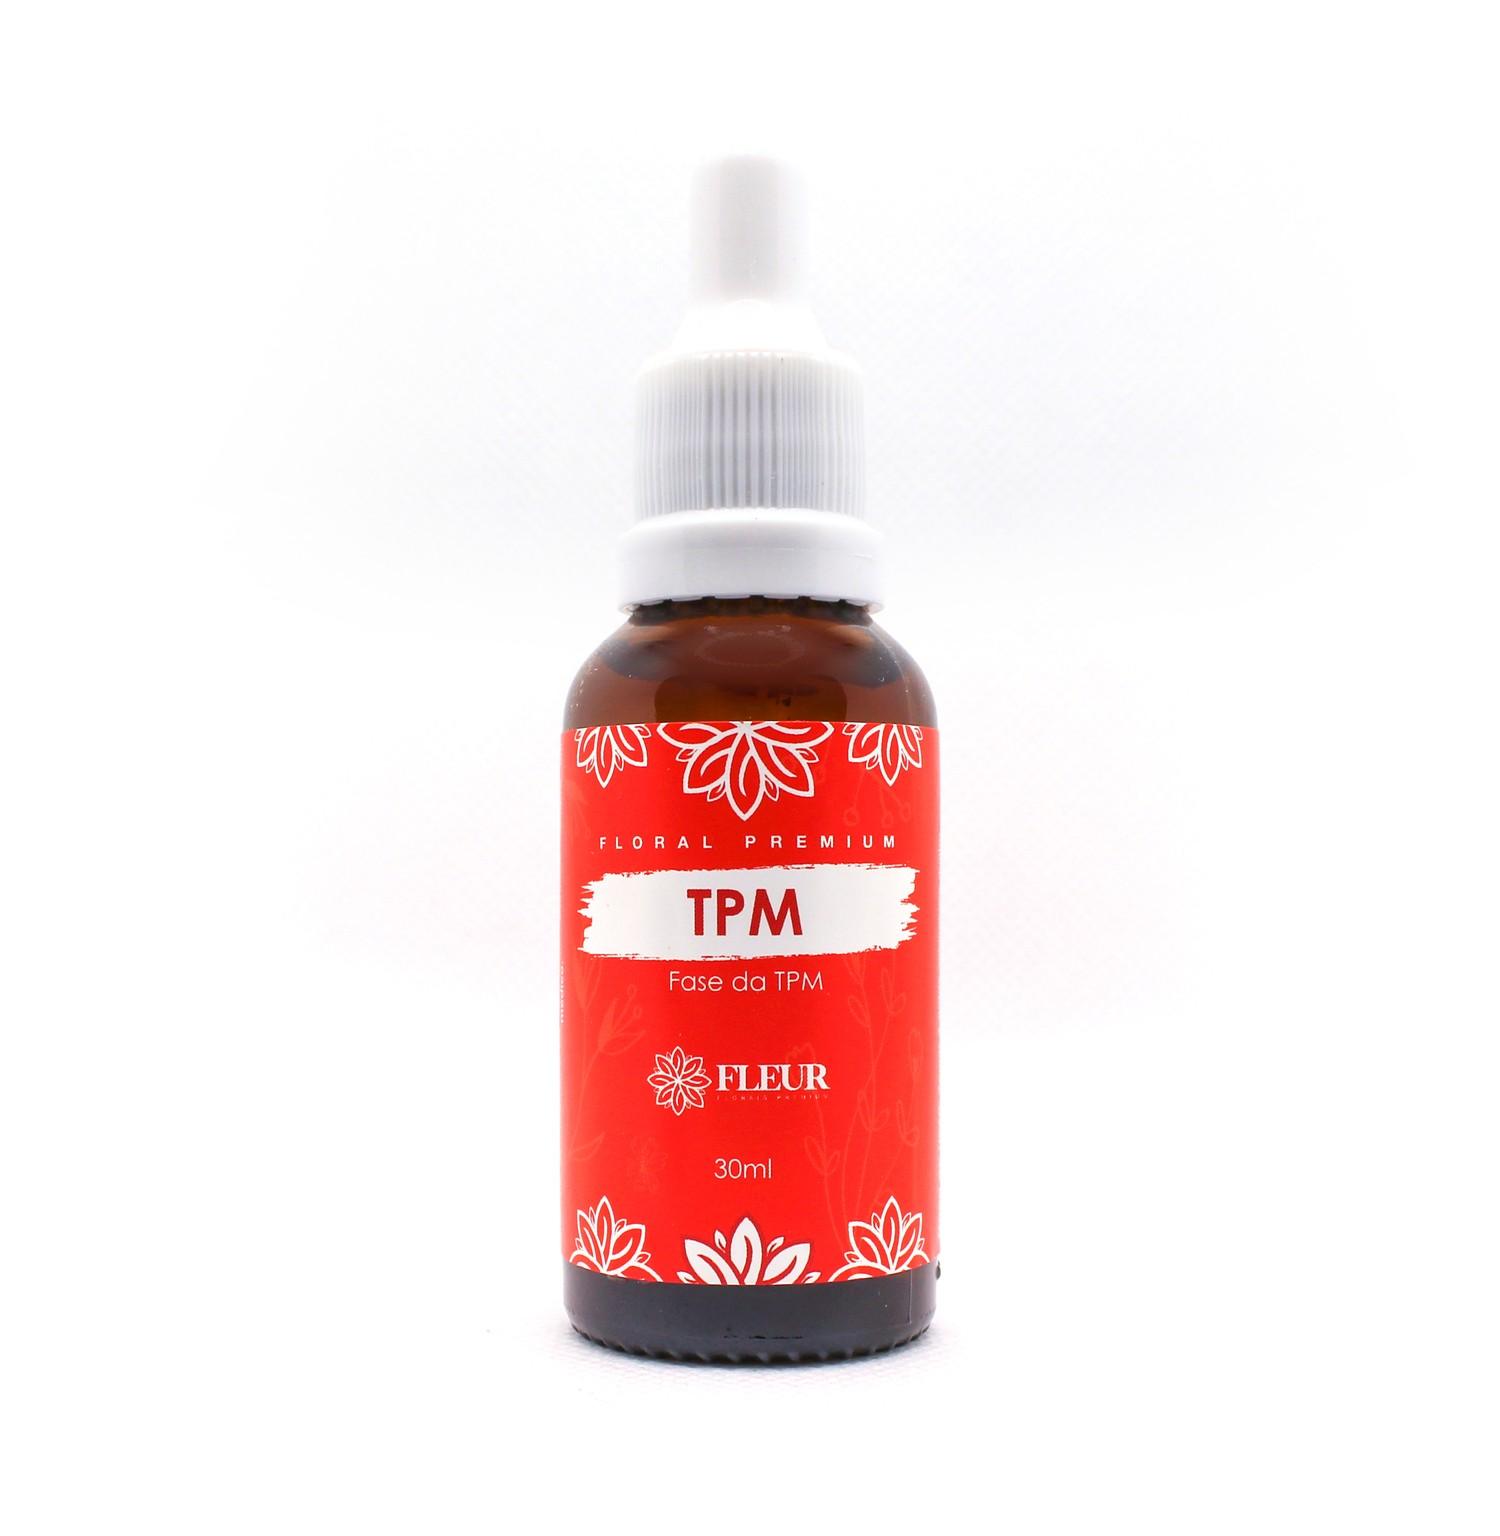 Floral para TPM 30ml